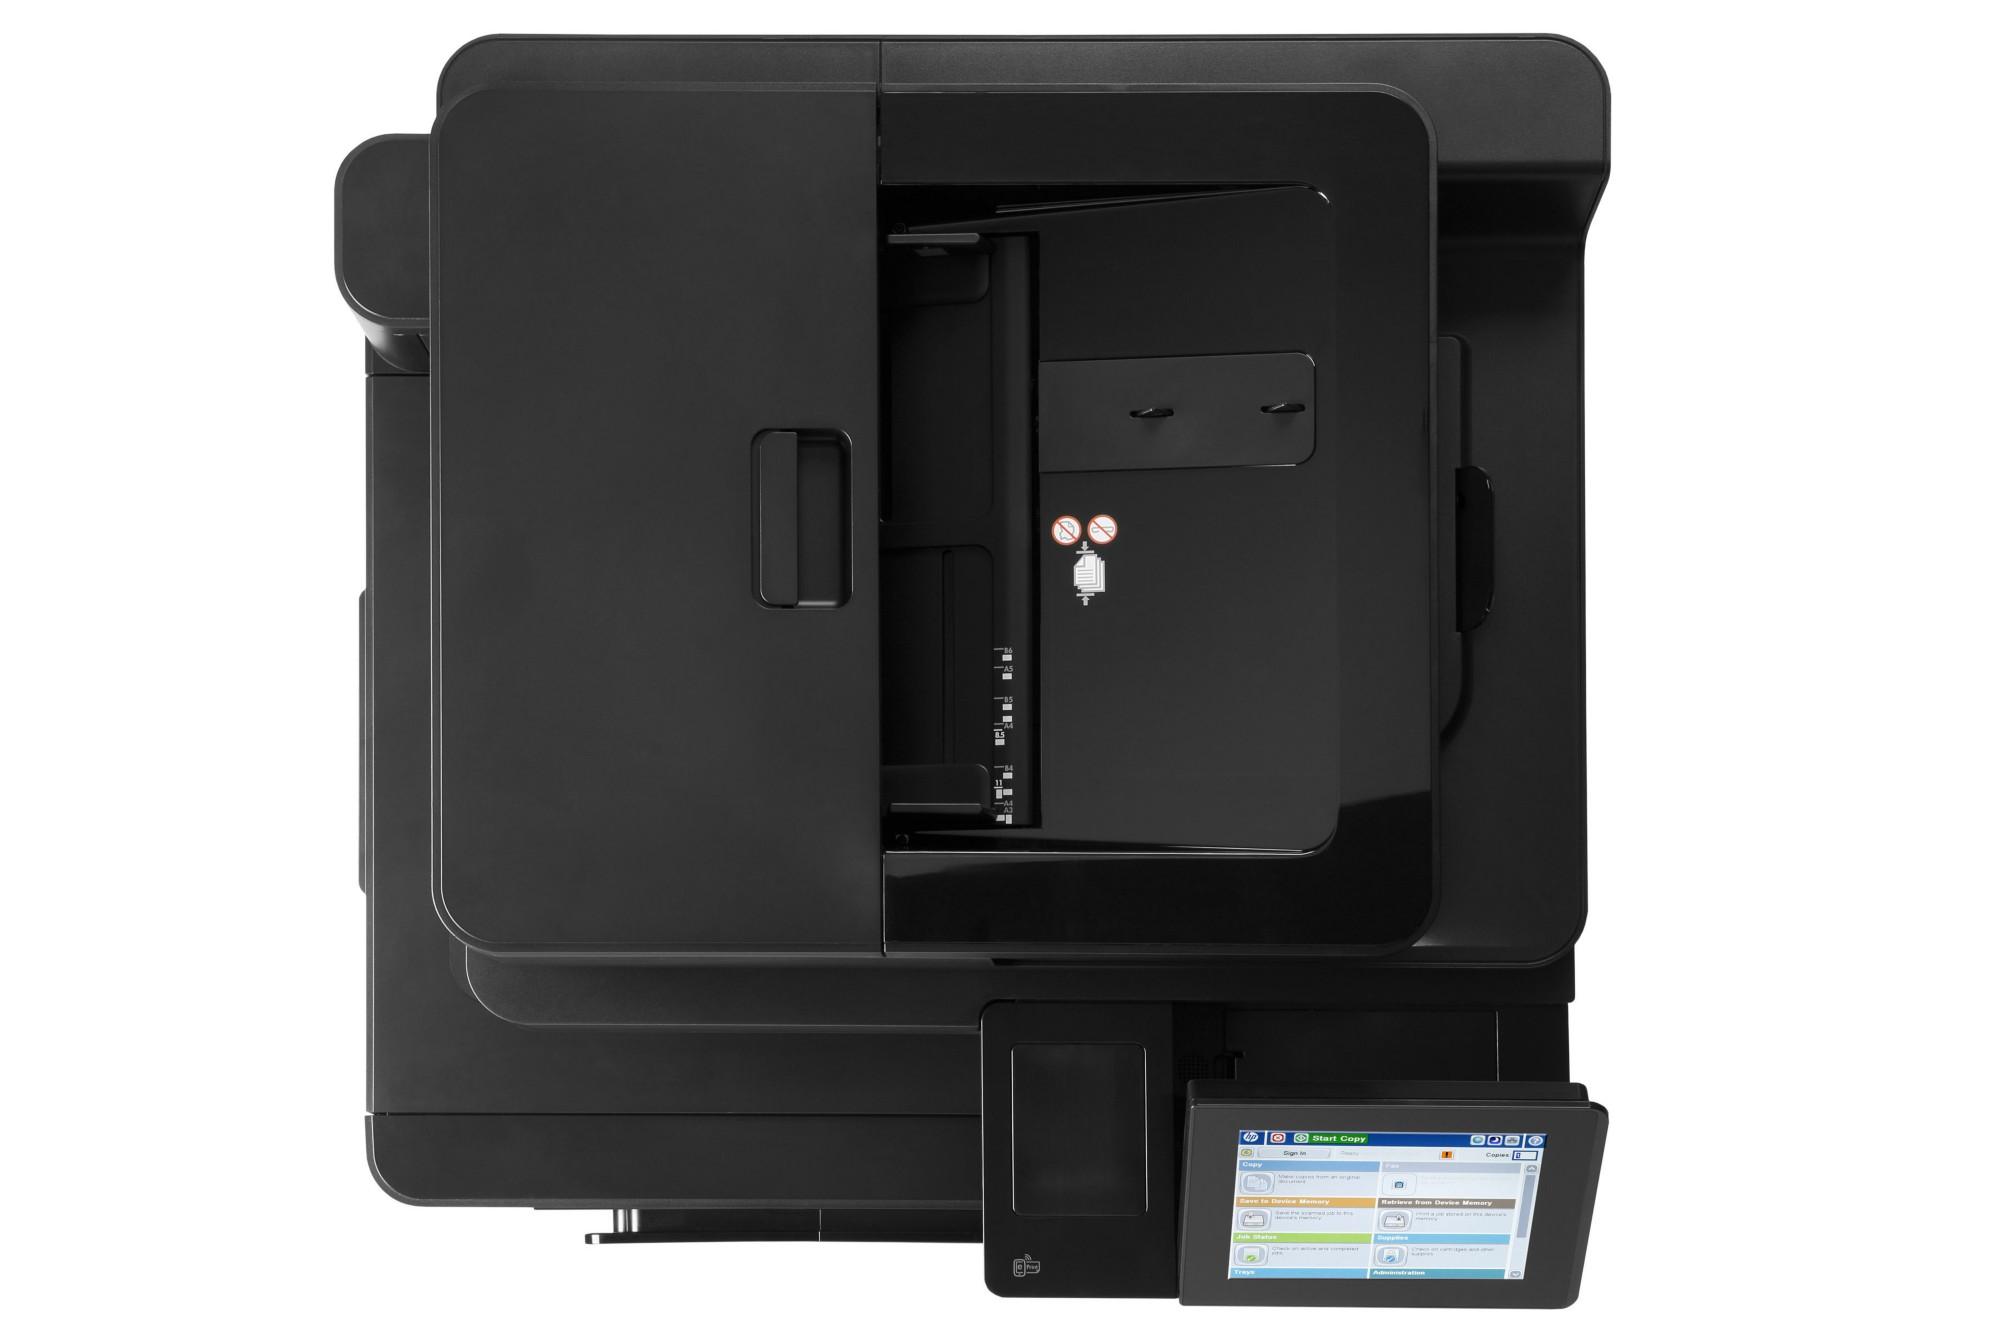 HP LaserJet Color Enterprise flow MFP M880z+